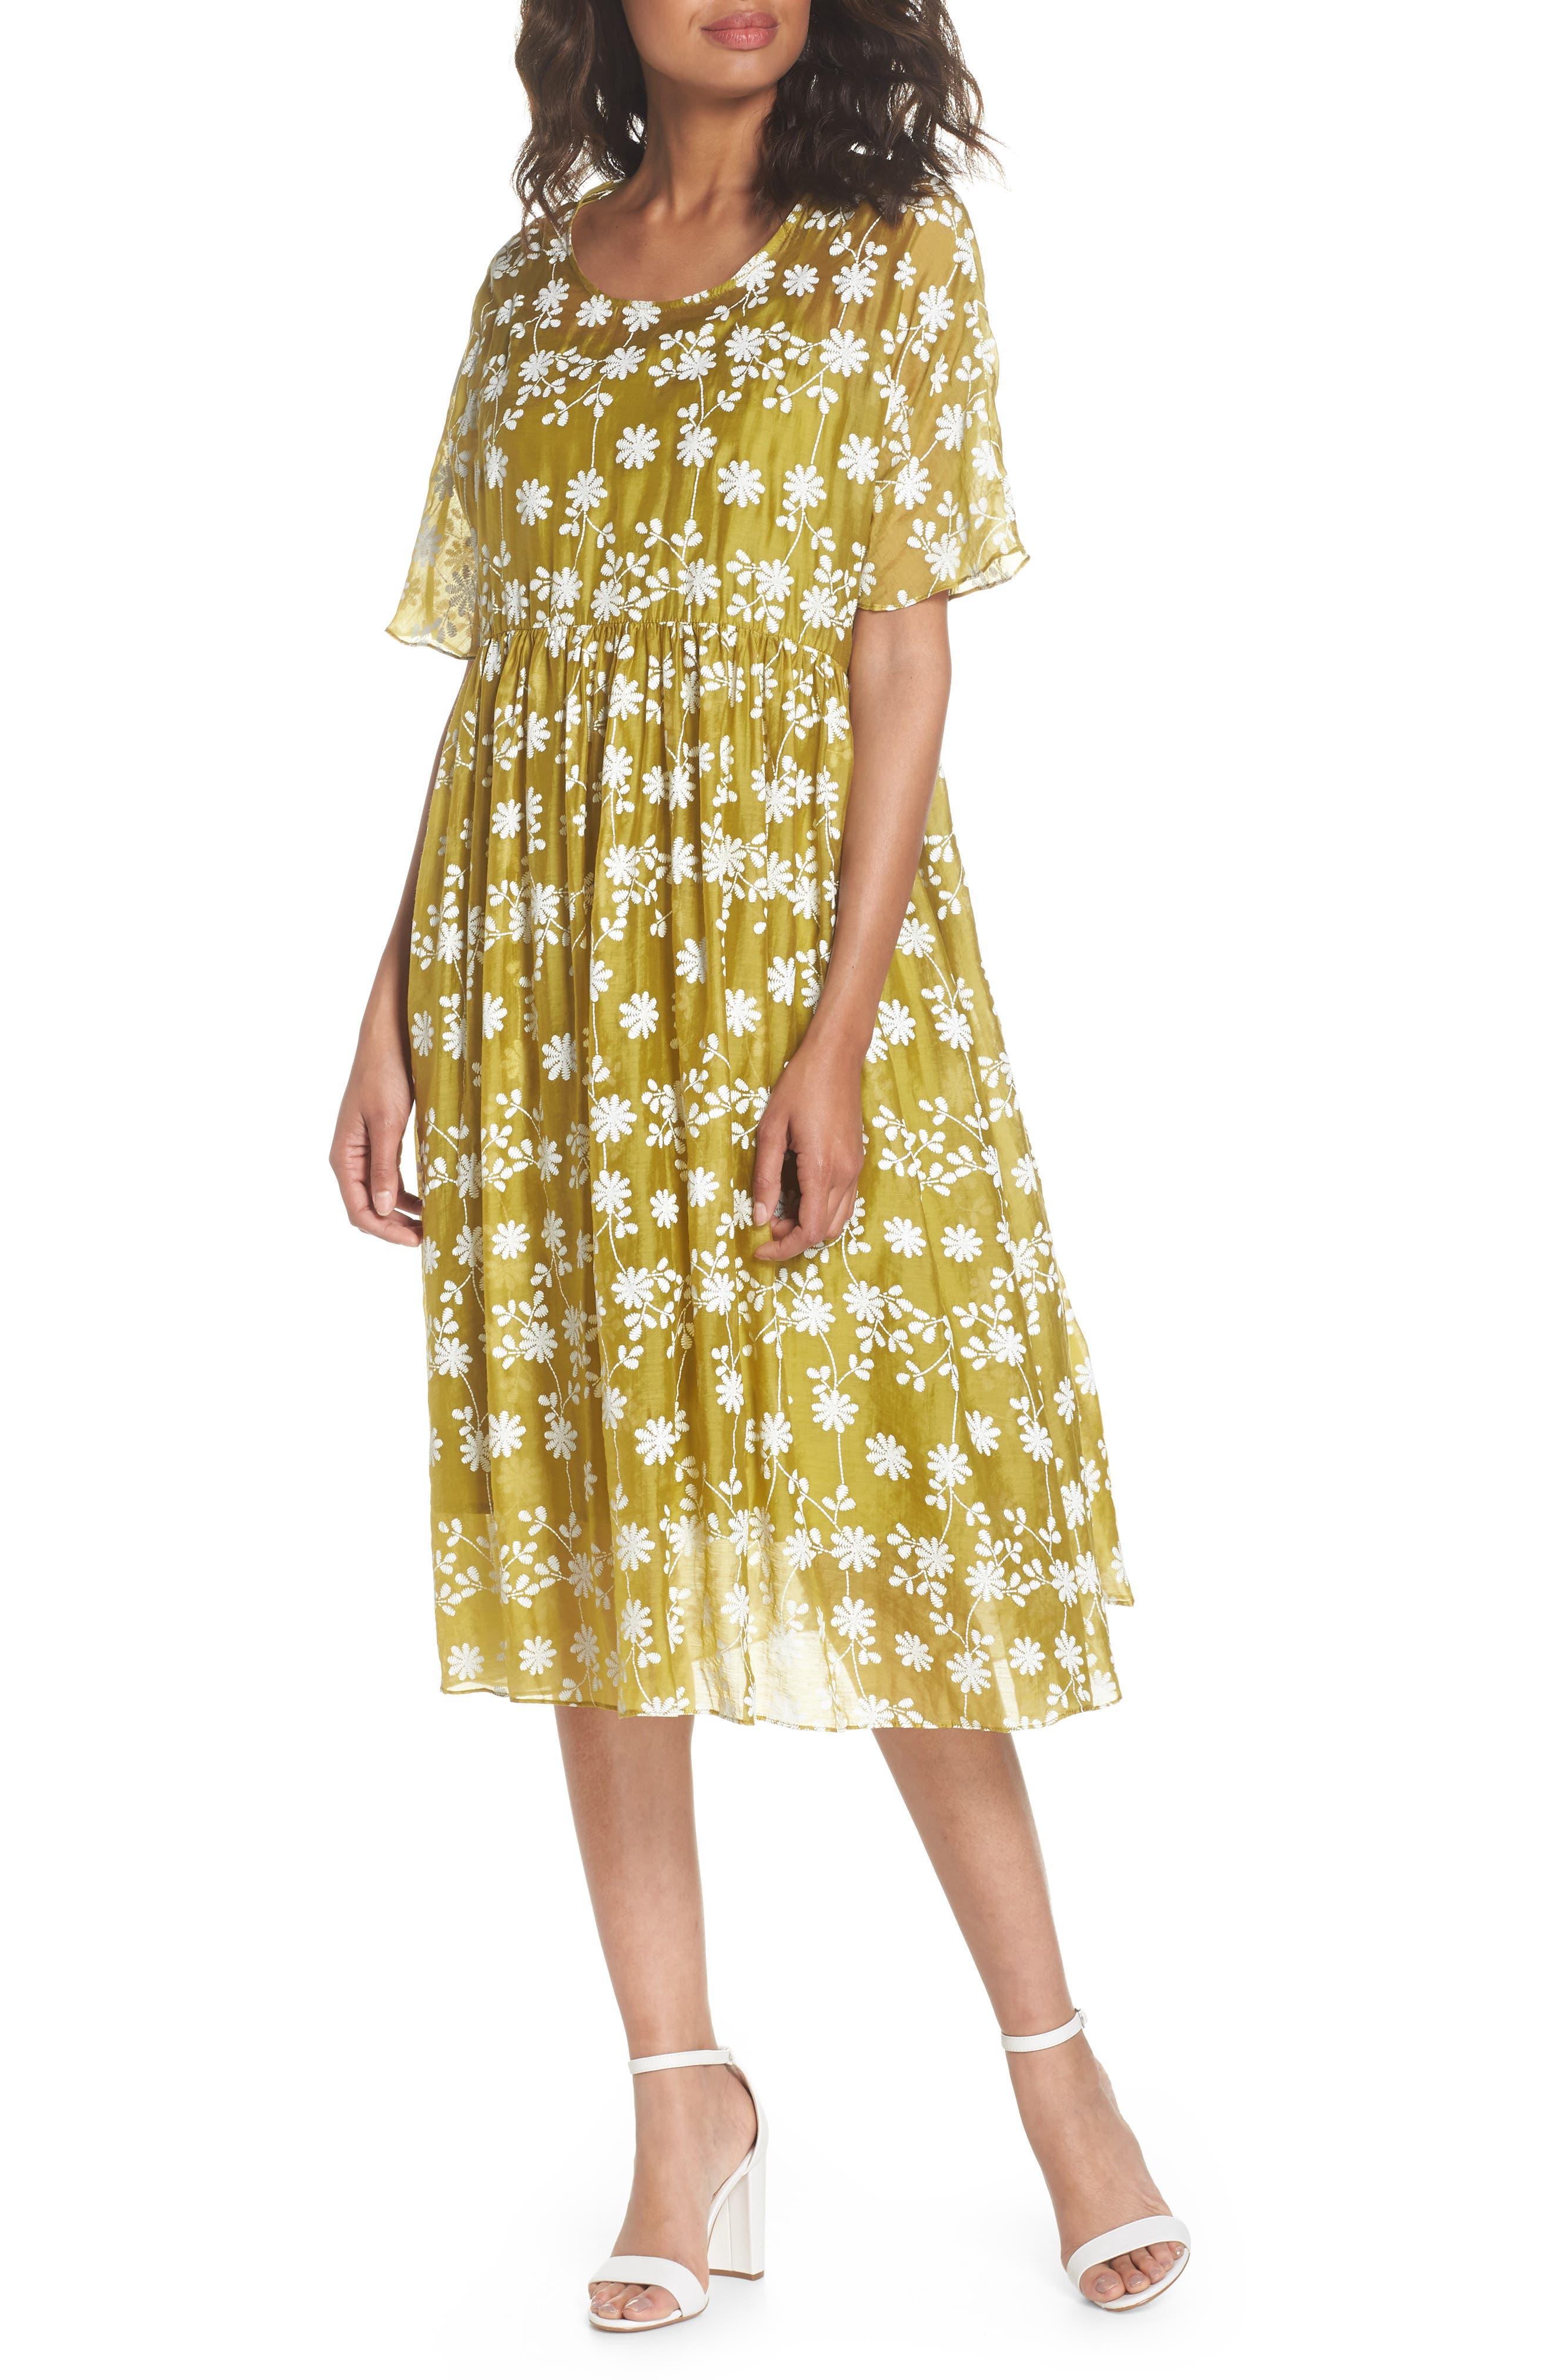 Daisy Picking Floral Dress,                             Main thumbnail 1, color,                             700